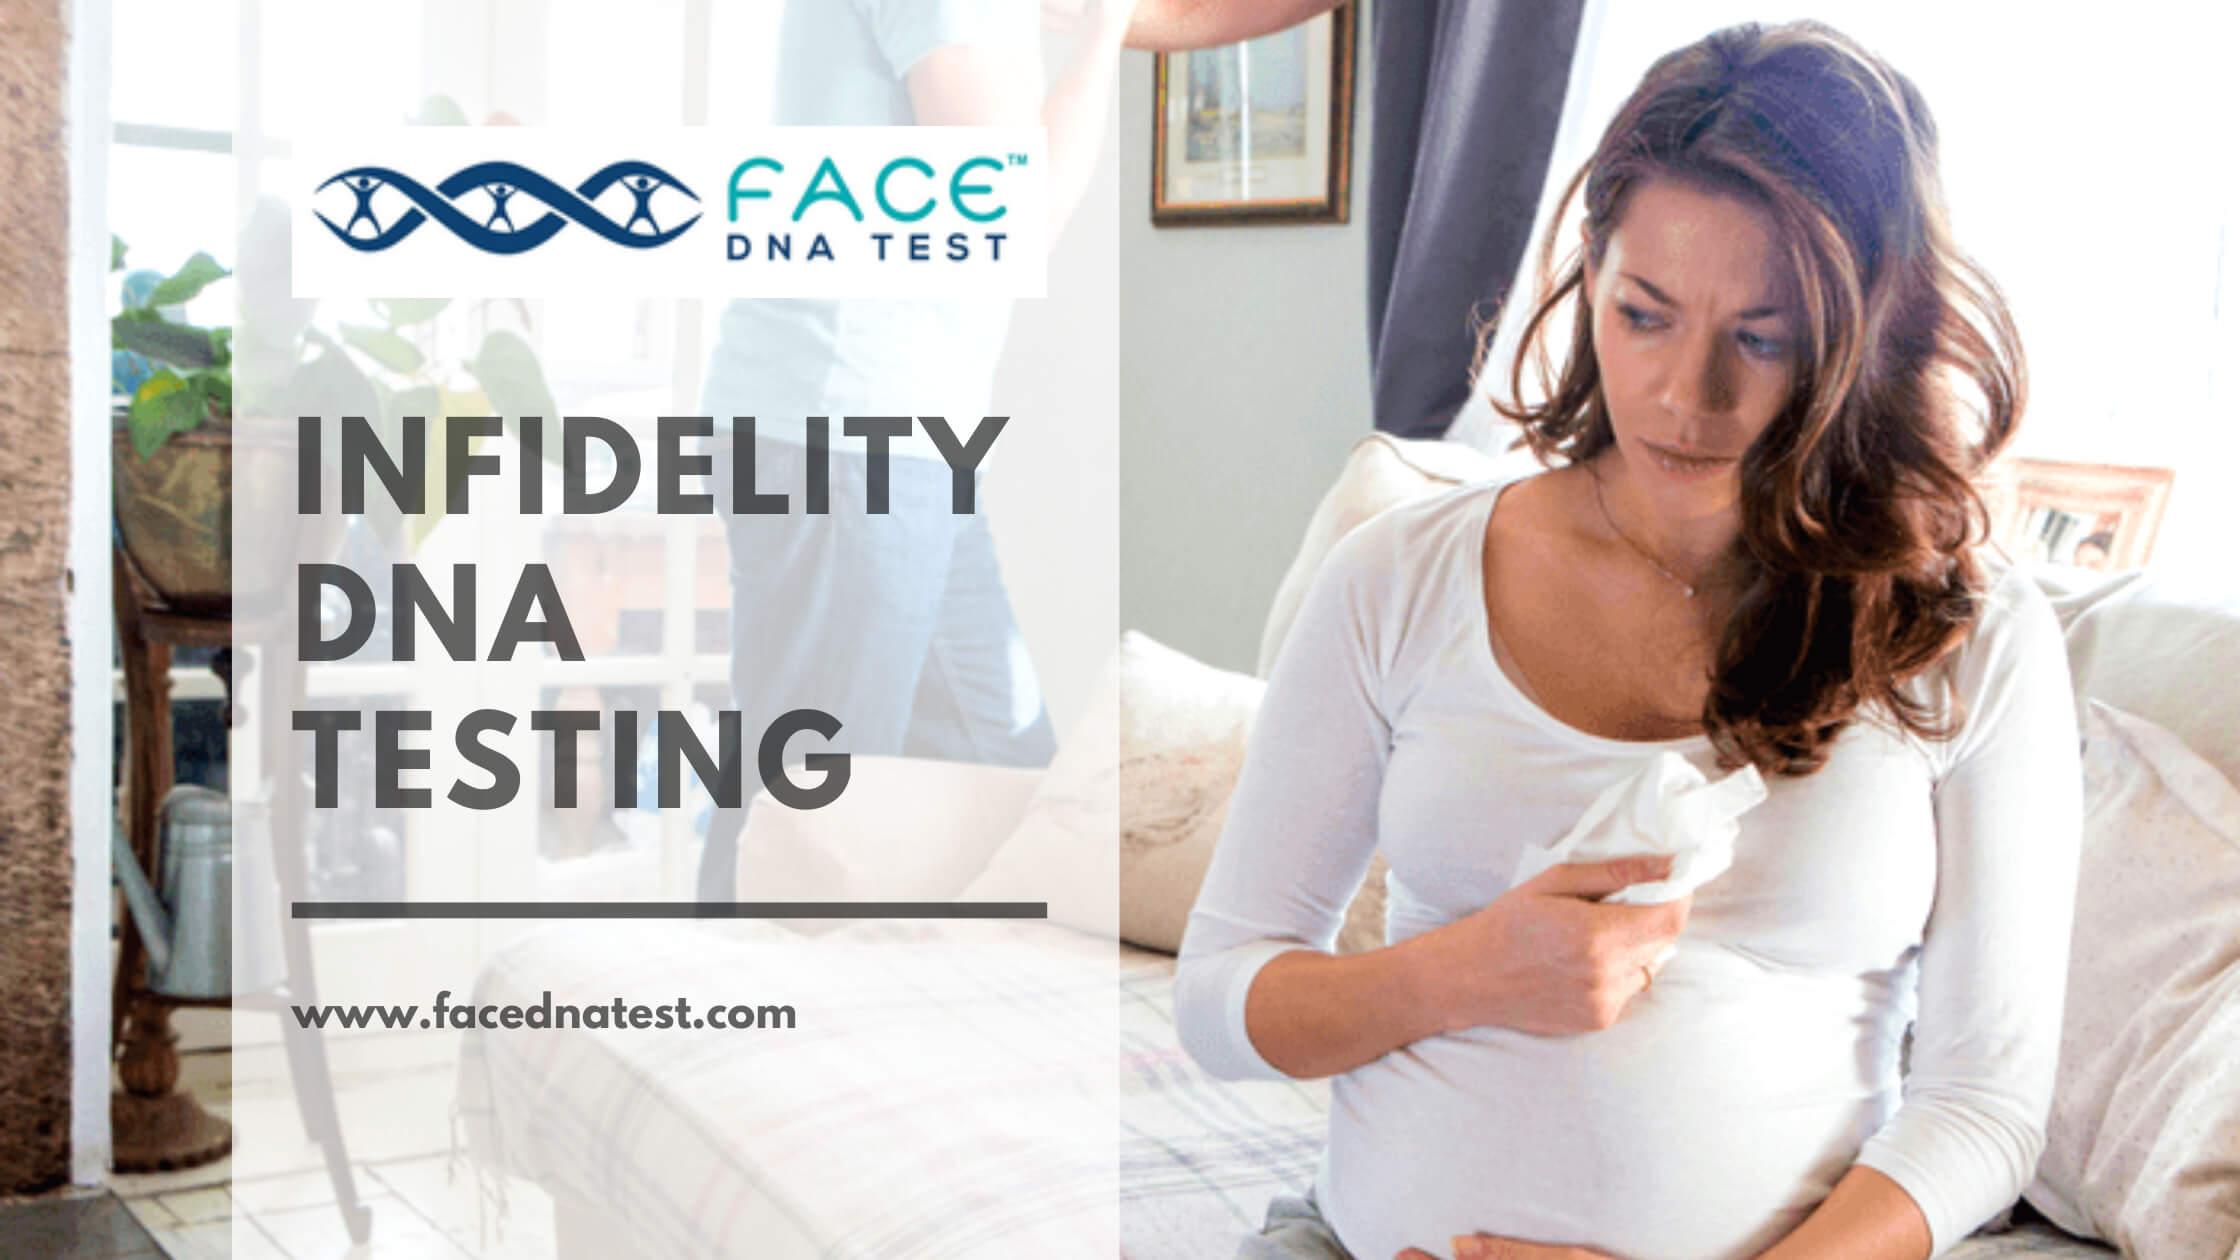 Infidelity DNA Testing